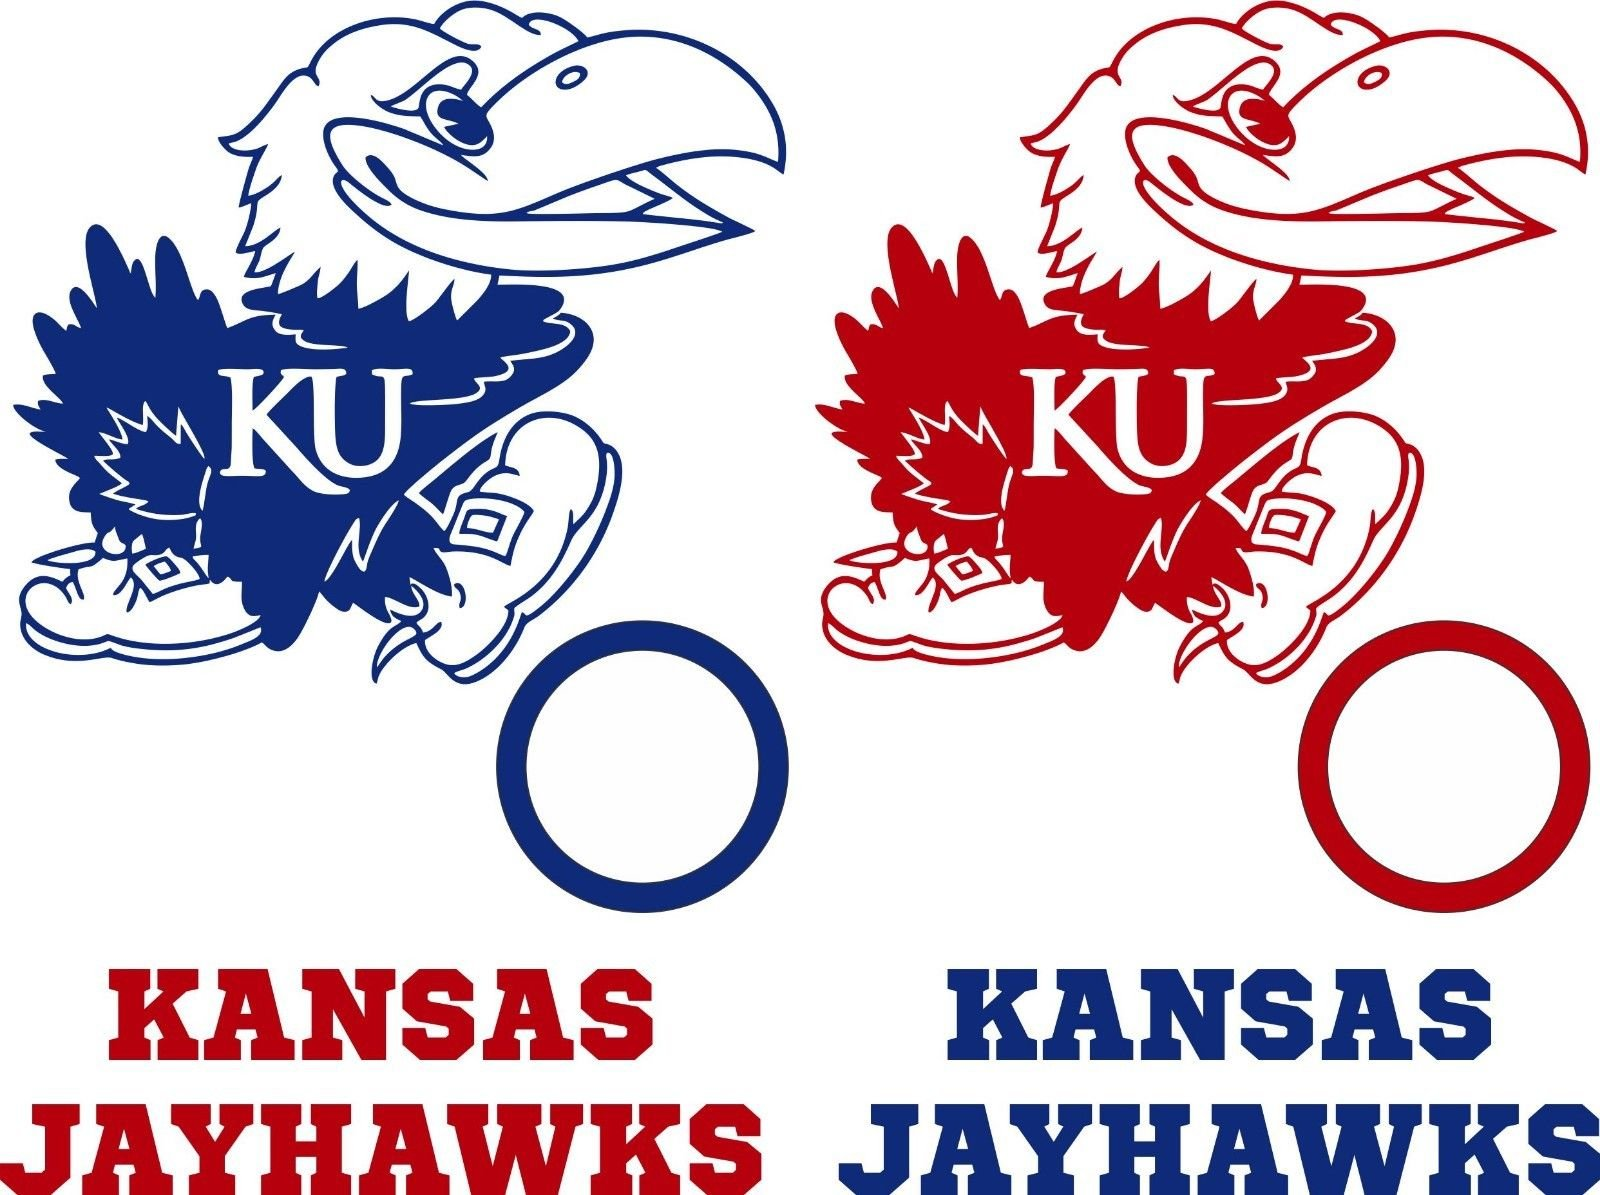 Kansas Jayhawks Cornhole Decals - 6 Cornhole Decals With Circles